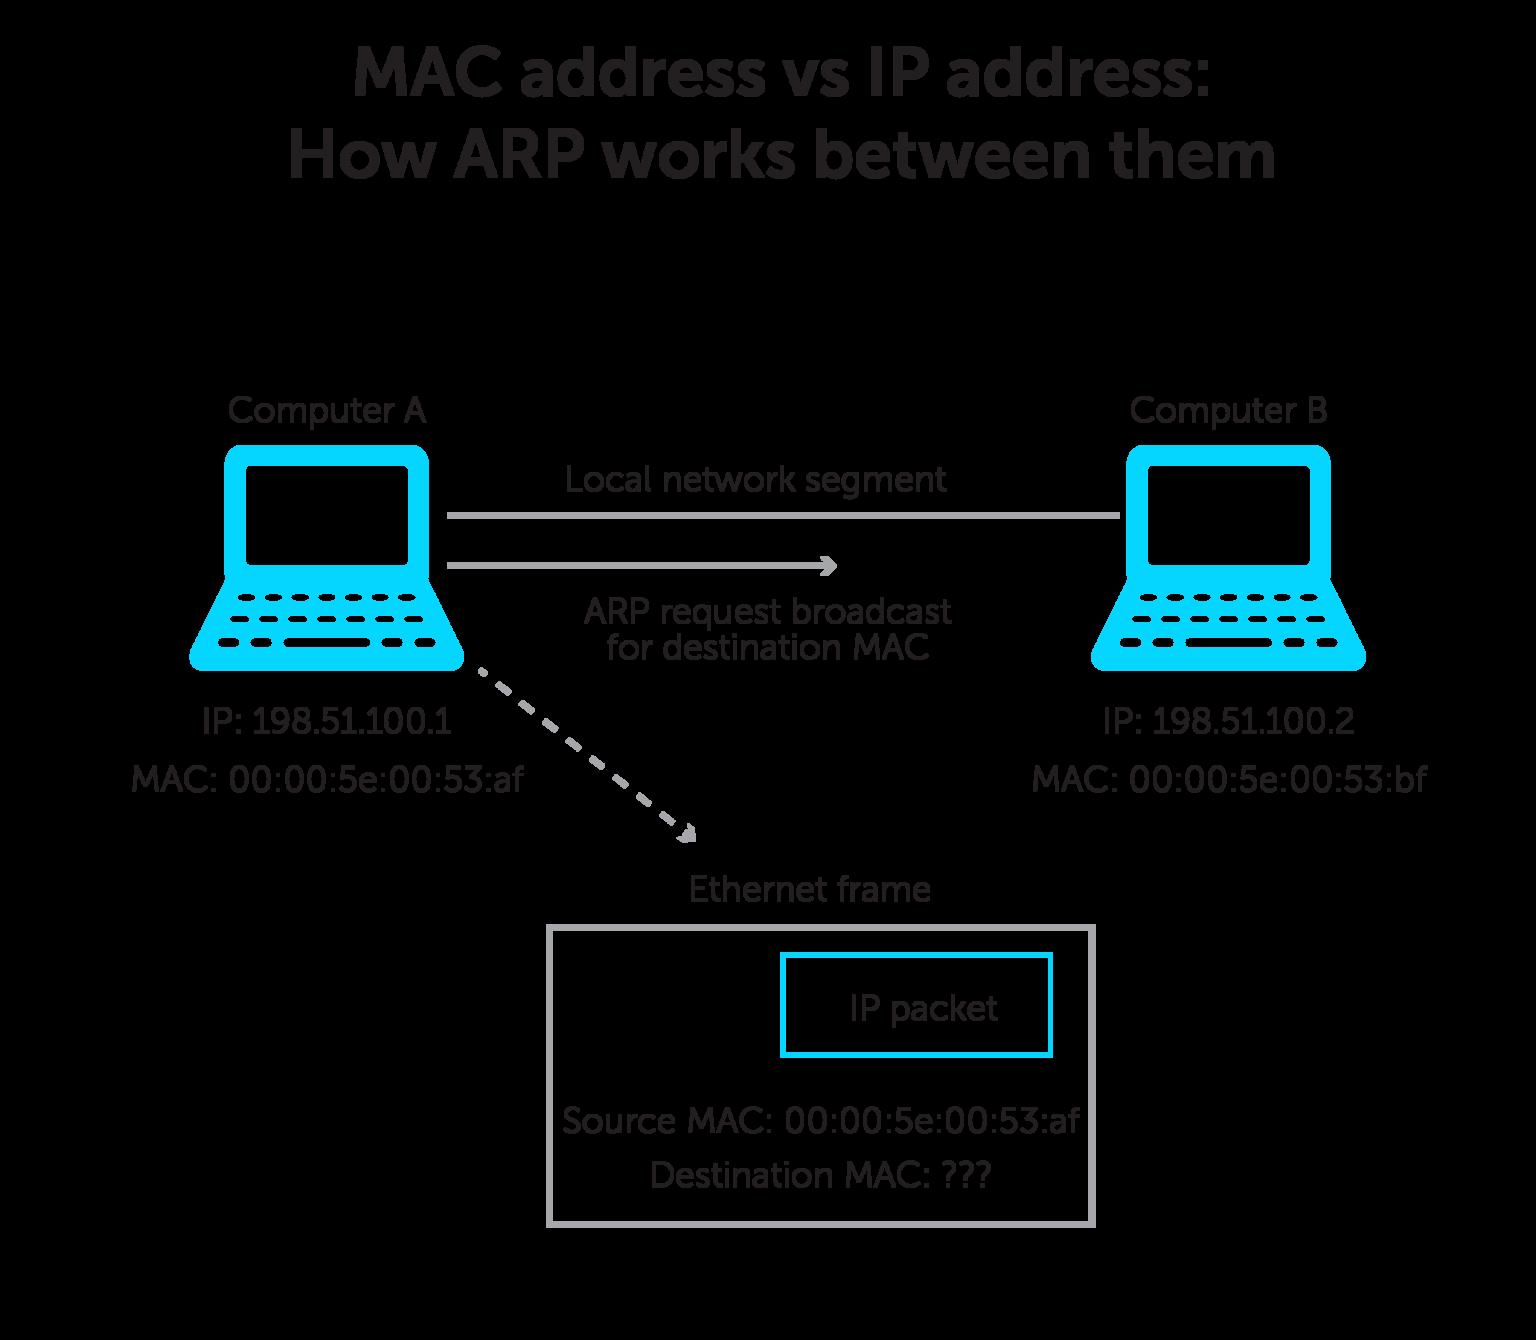 MAC address vs IP address